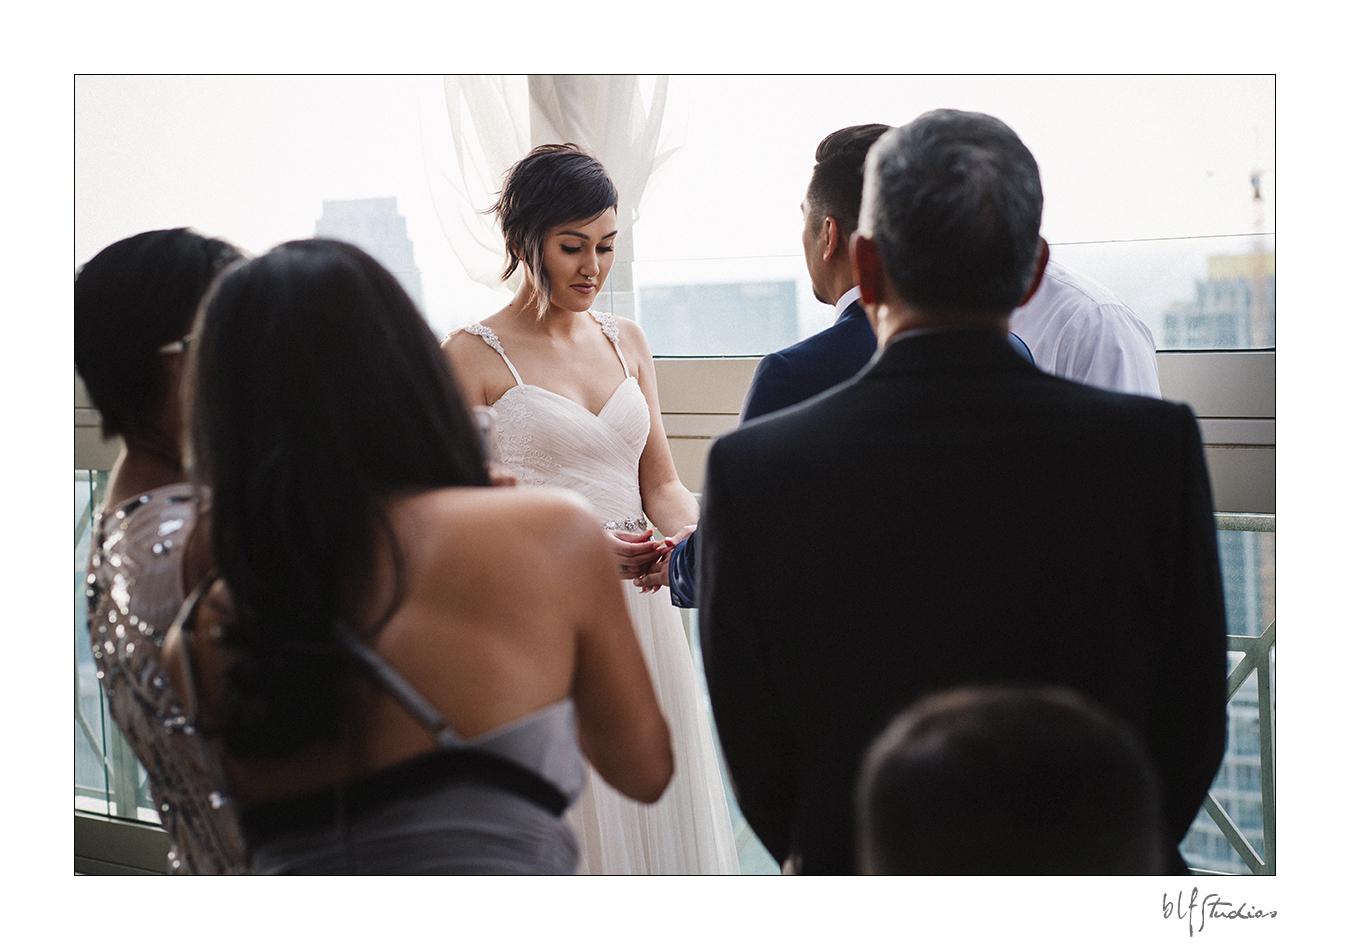 0021-blfstudios-wedding-photographer-daniel-danielle-atlanta.jpg